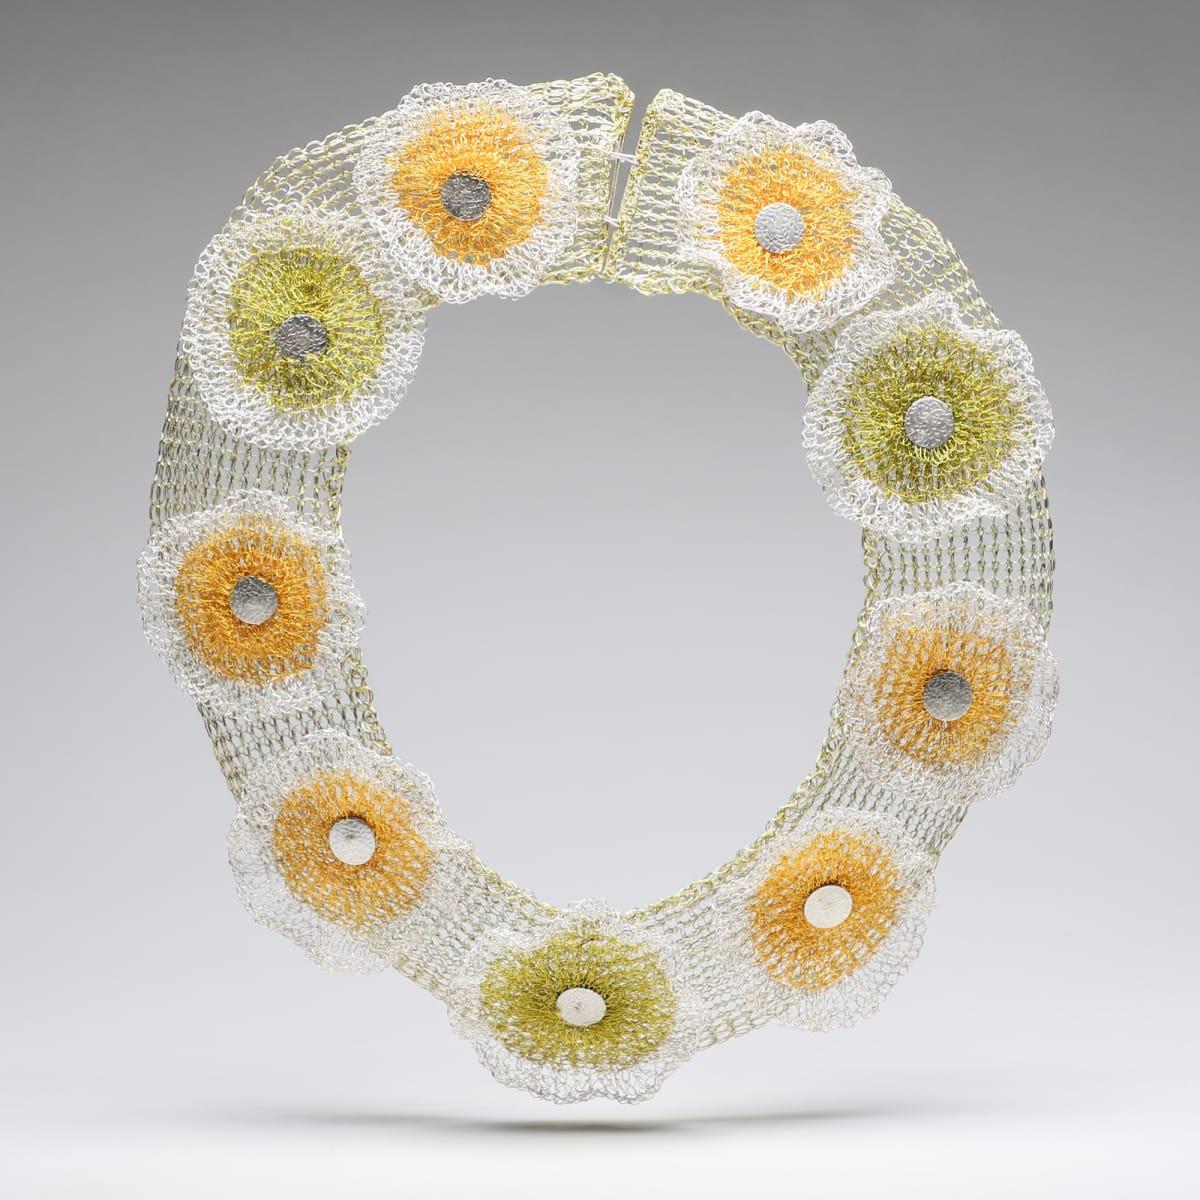 Arline Fisch, Green & Yellow Flowers, 2016